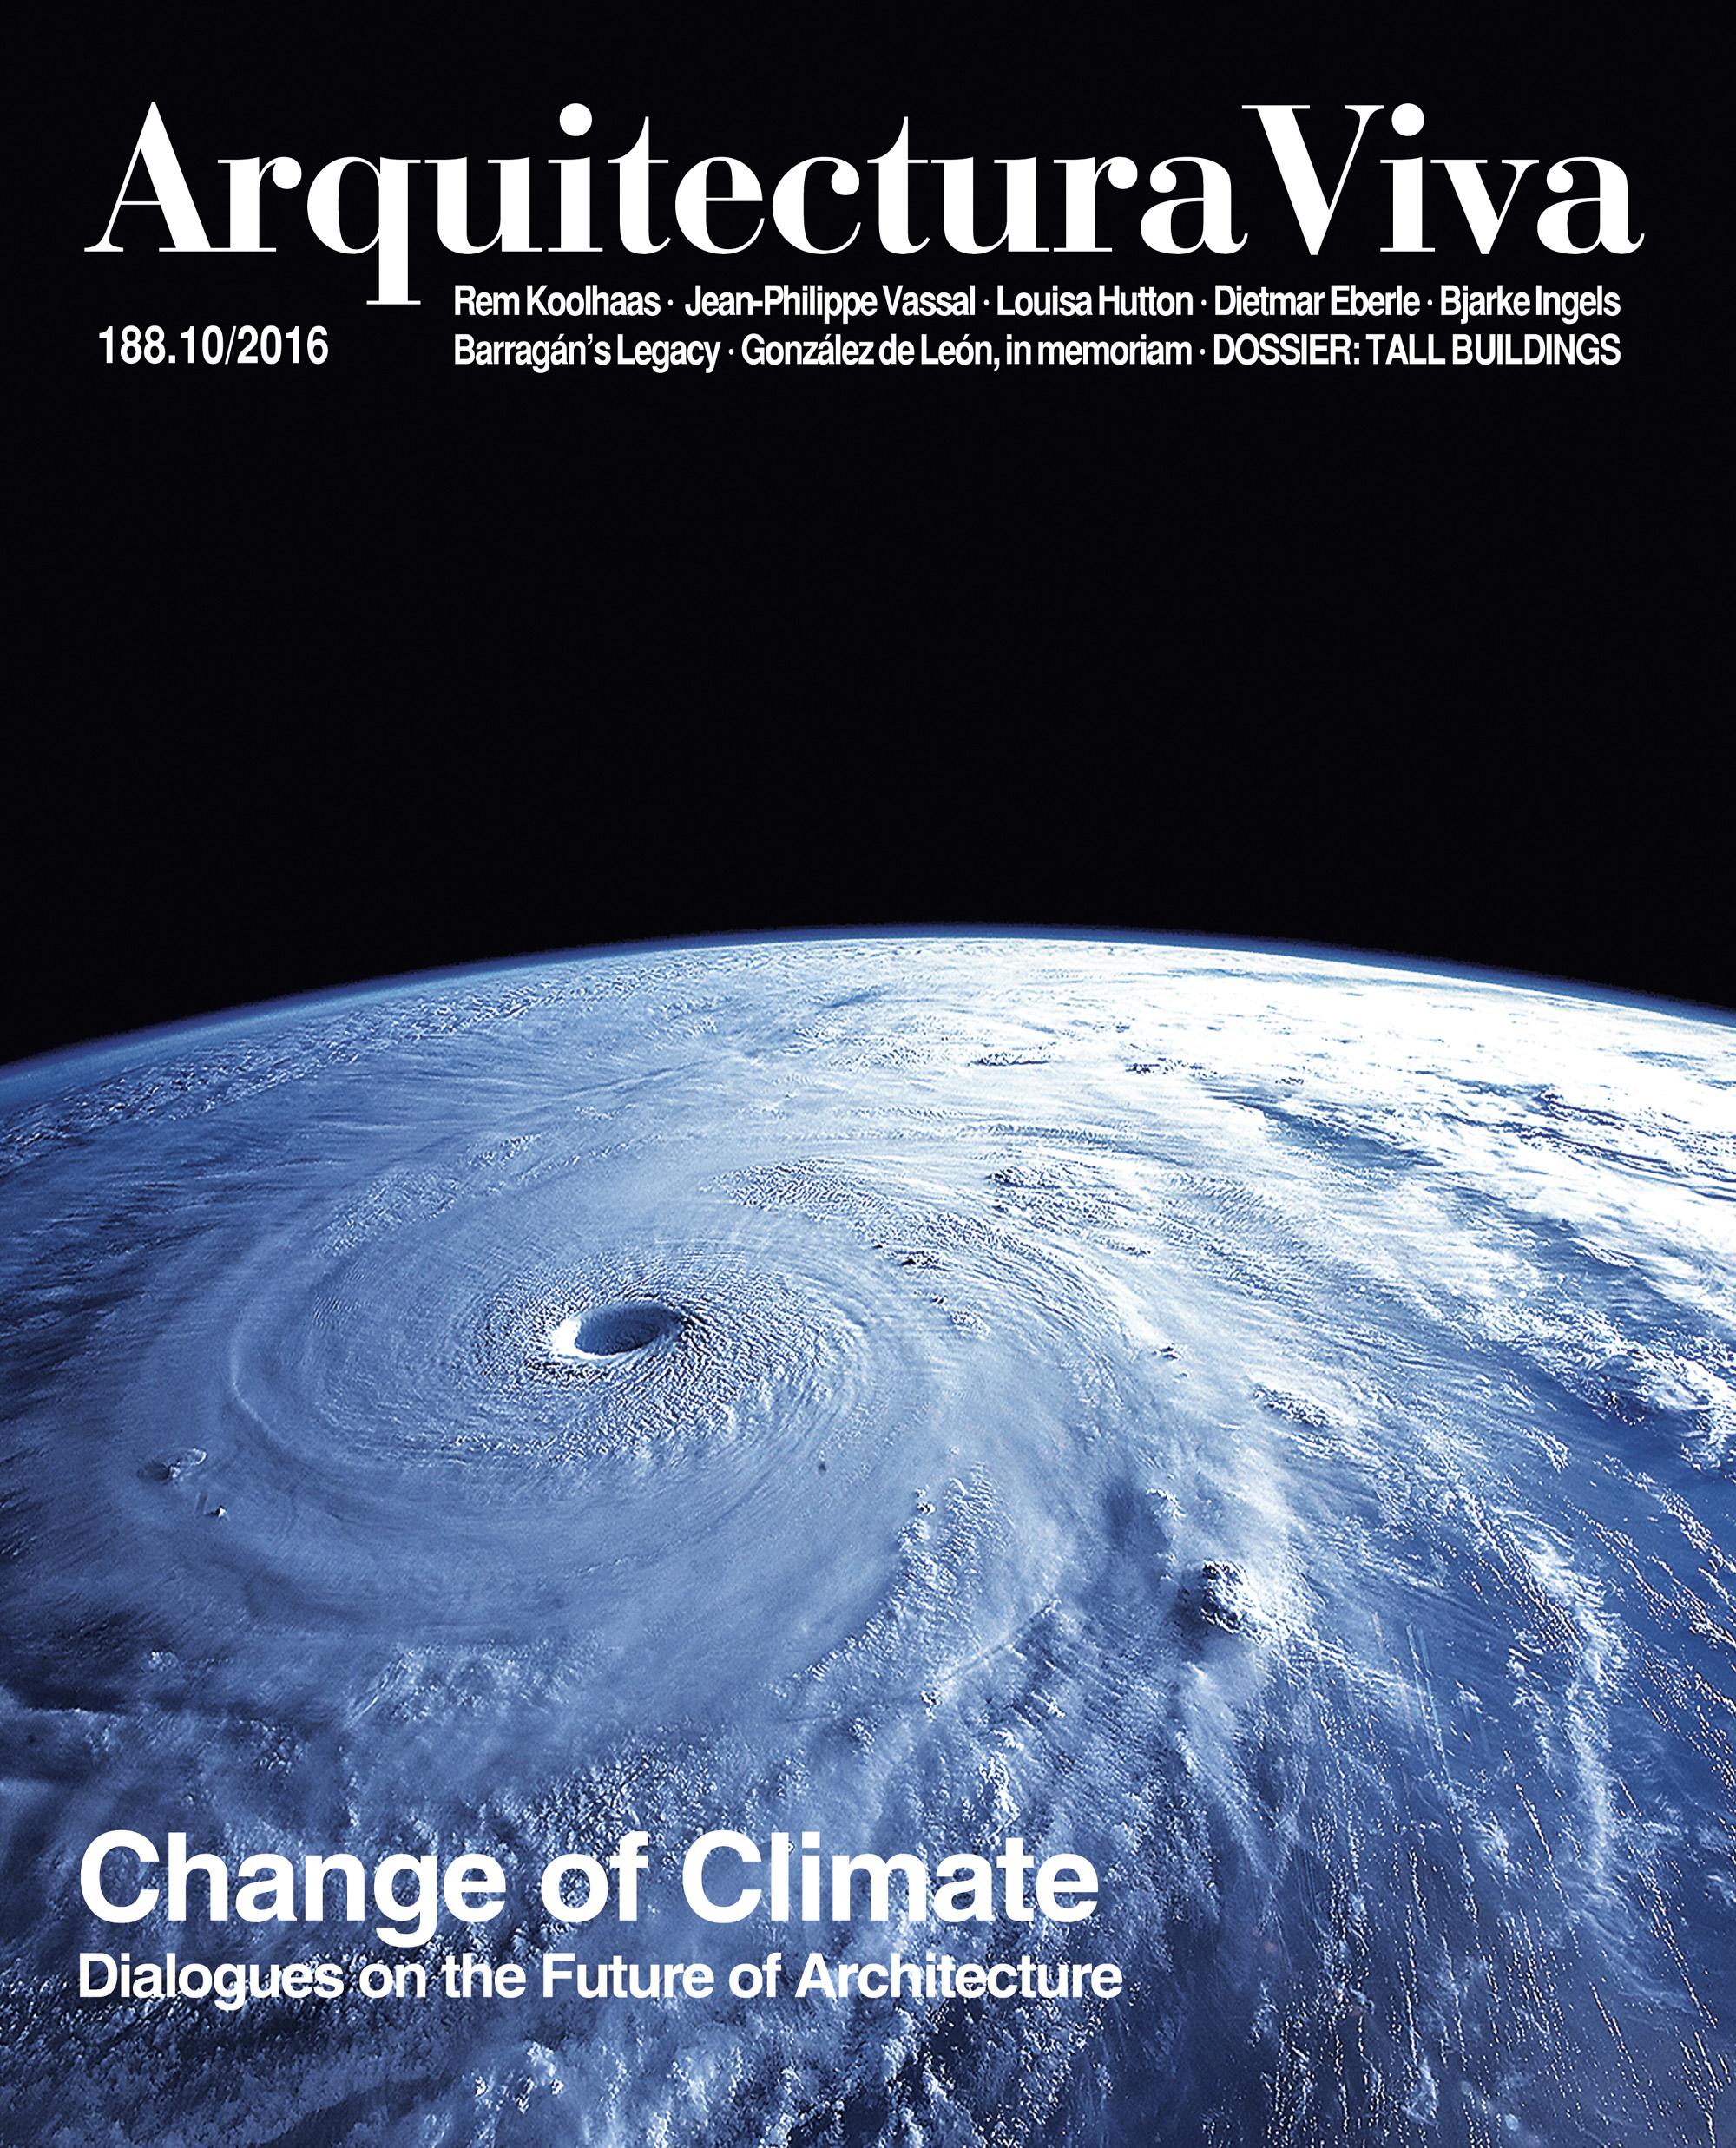 Cambio de clima